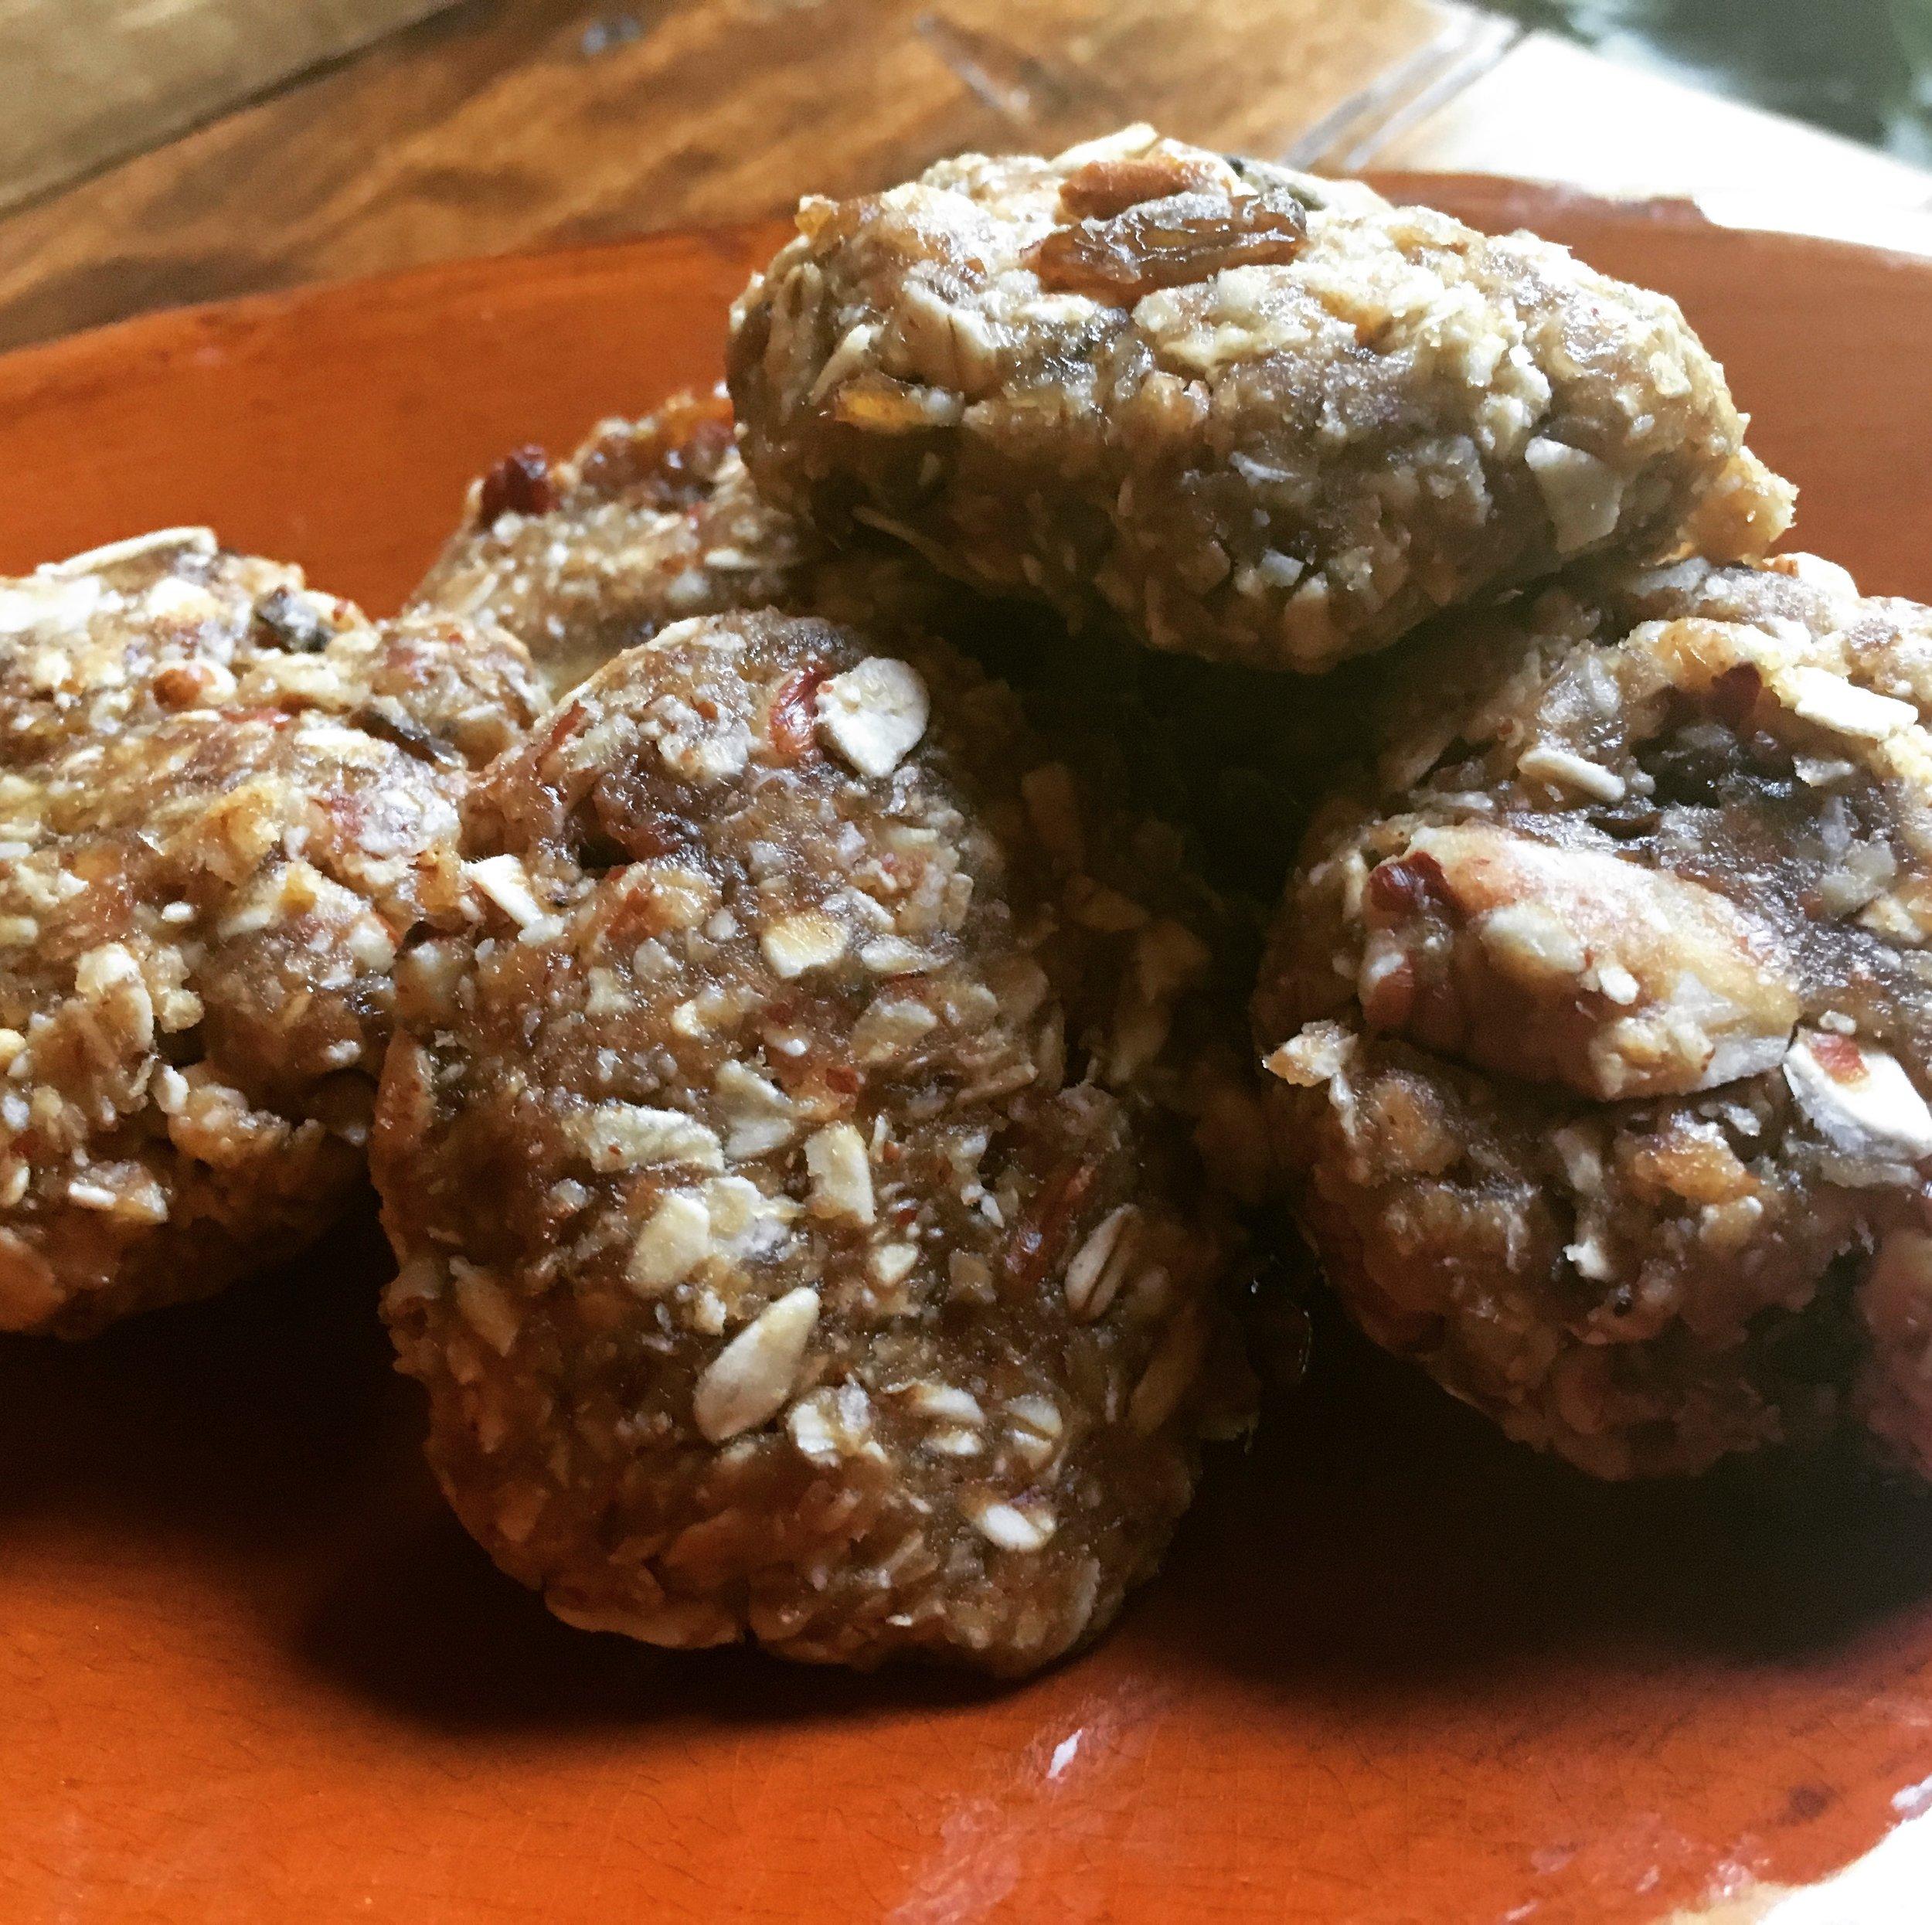 No Bake Oatmeal Cookies.JPG